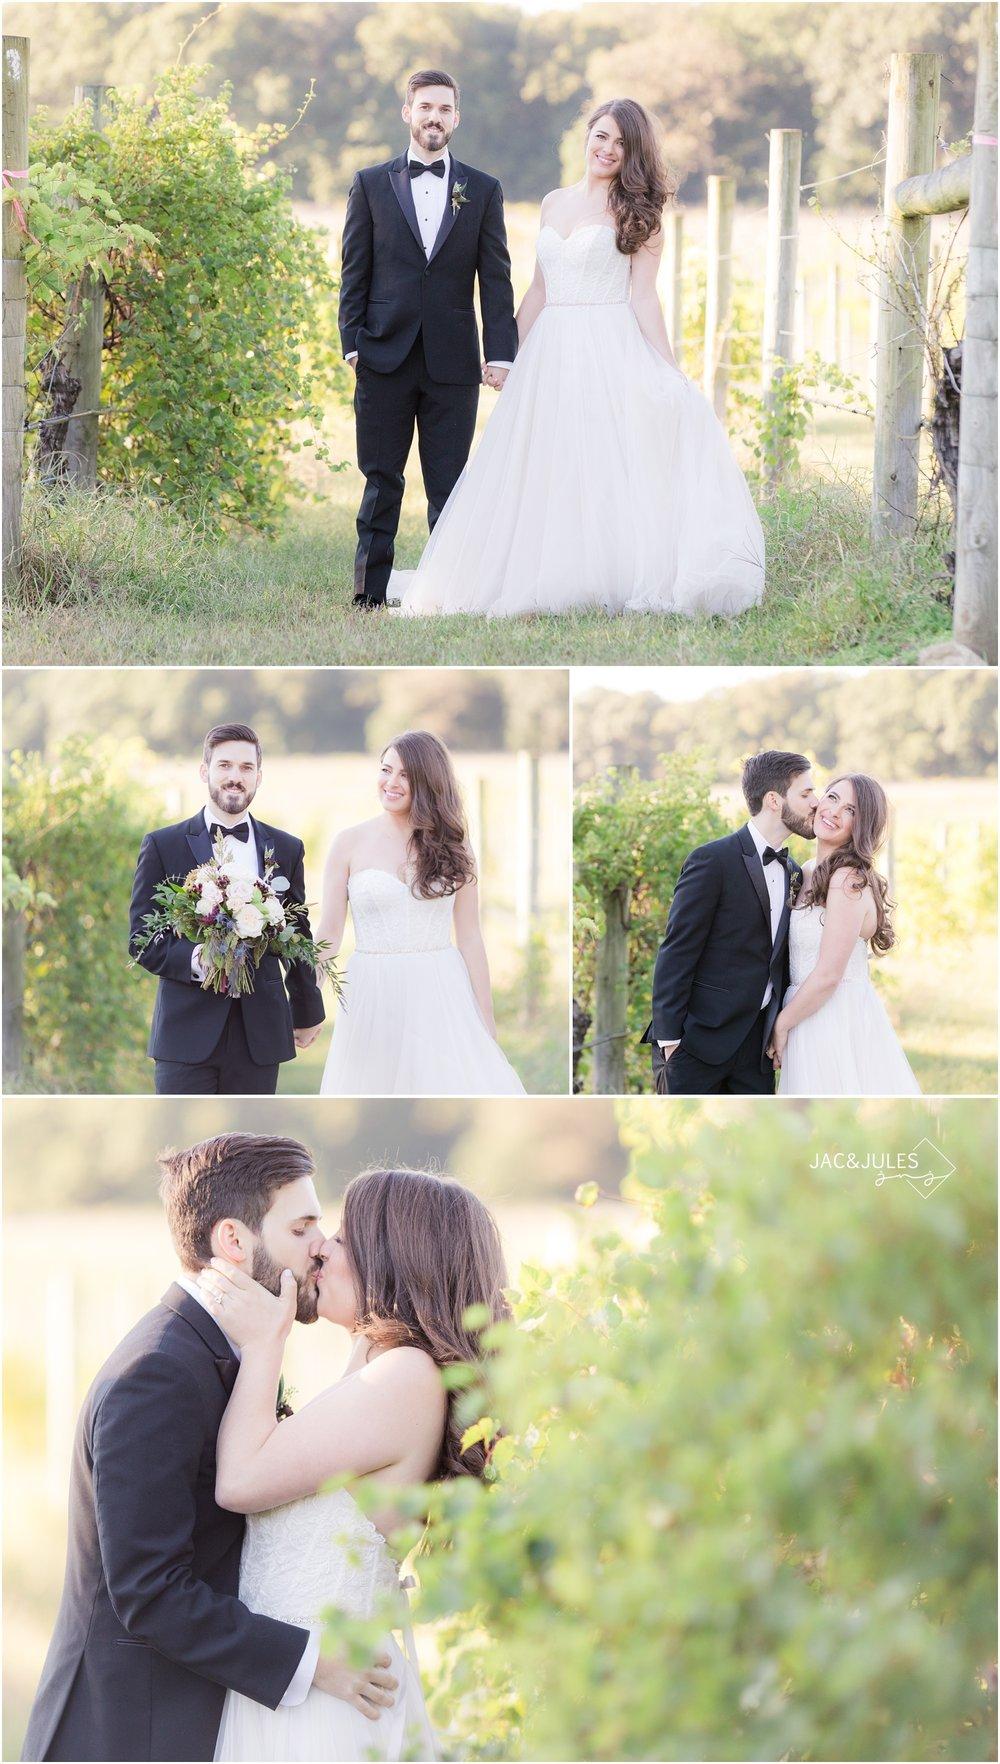 fun romantic wedding photos in the vineyard at Laurita Winery.